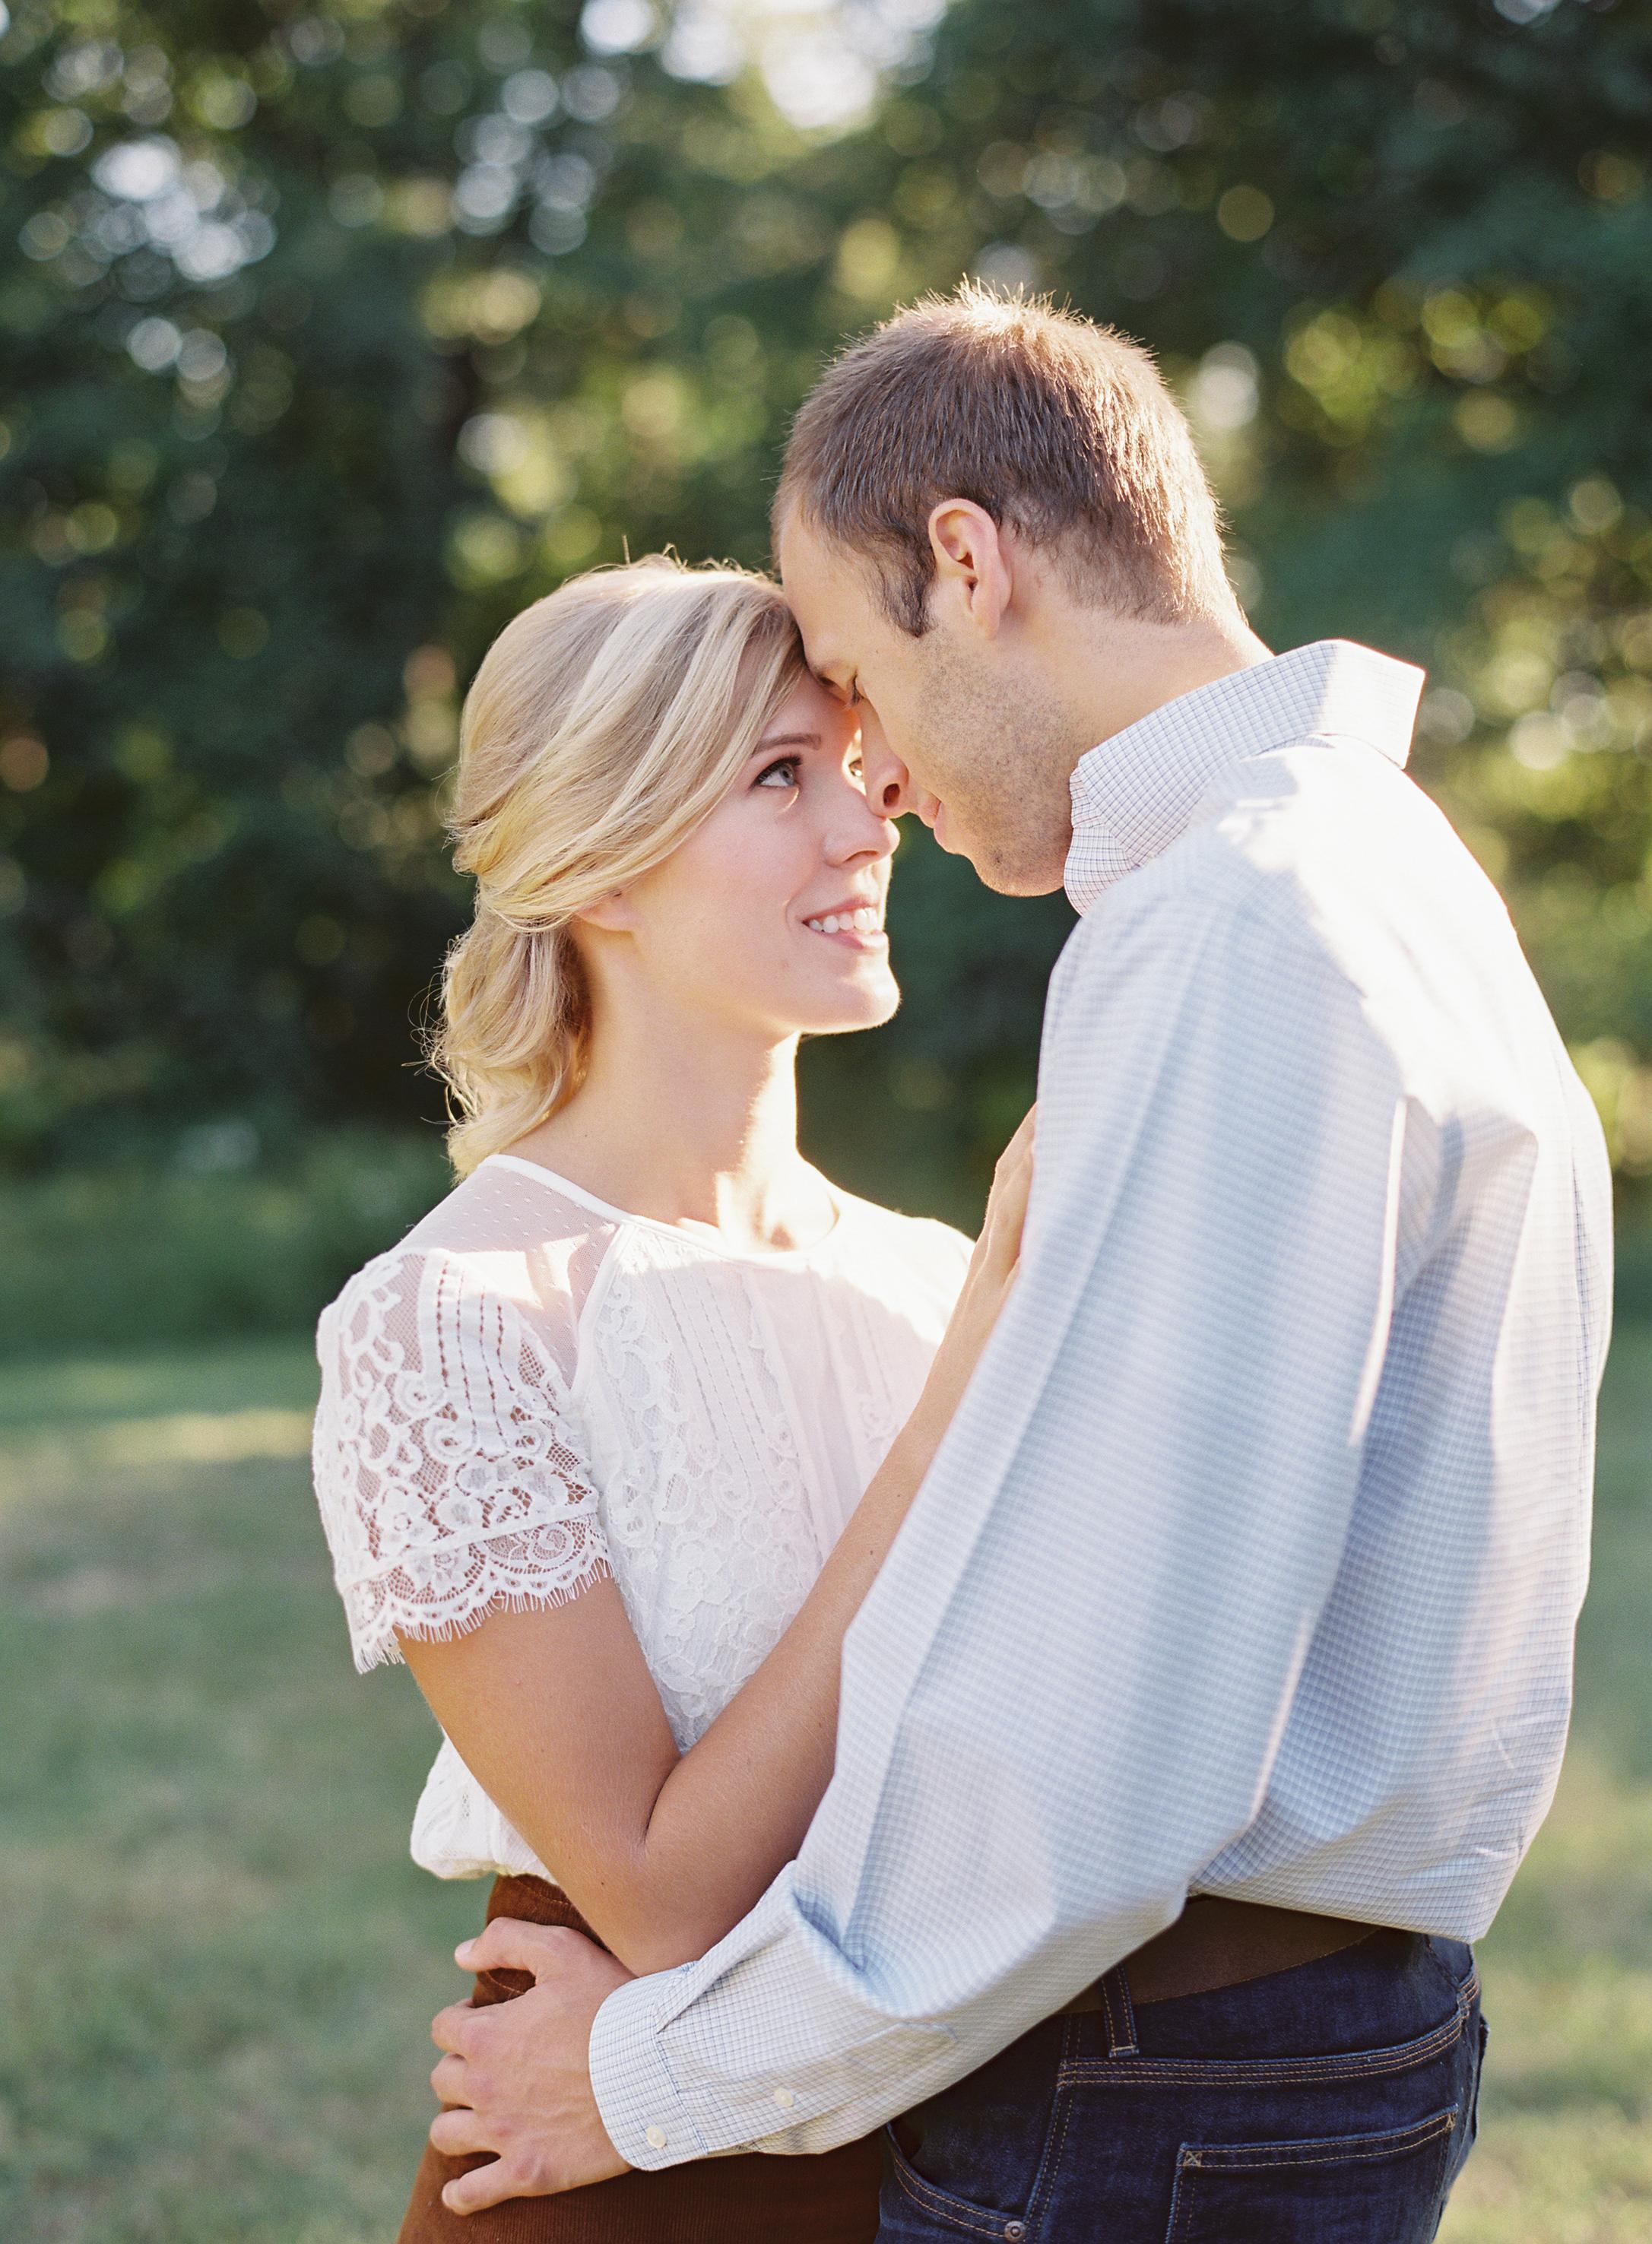 Meghan Mehan Photography | Fine Art Film Wedding Photographer | California | San Francisco | Napa | Sonoma | Santa Barbara | Big Sur | Los Angeles | Destination Wedding Photographer 002.jpg